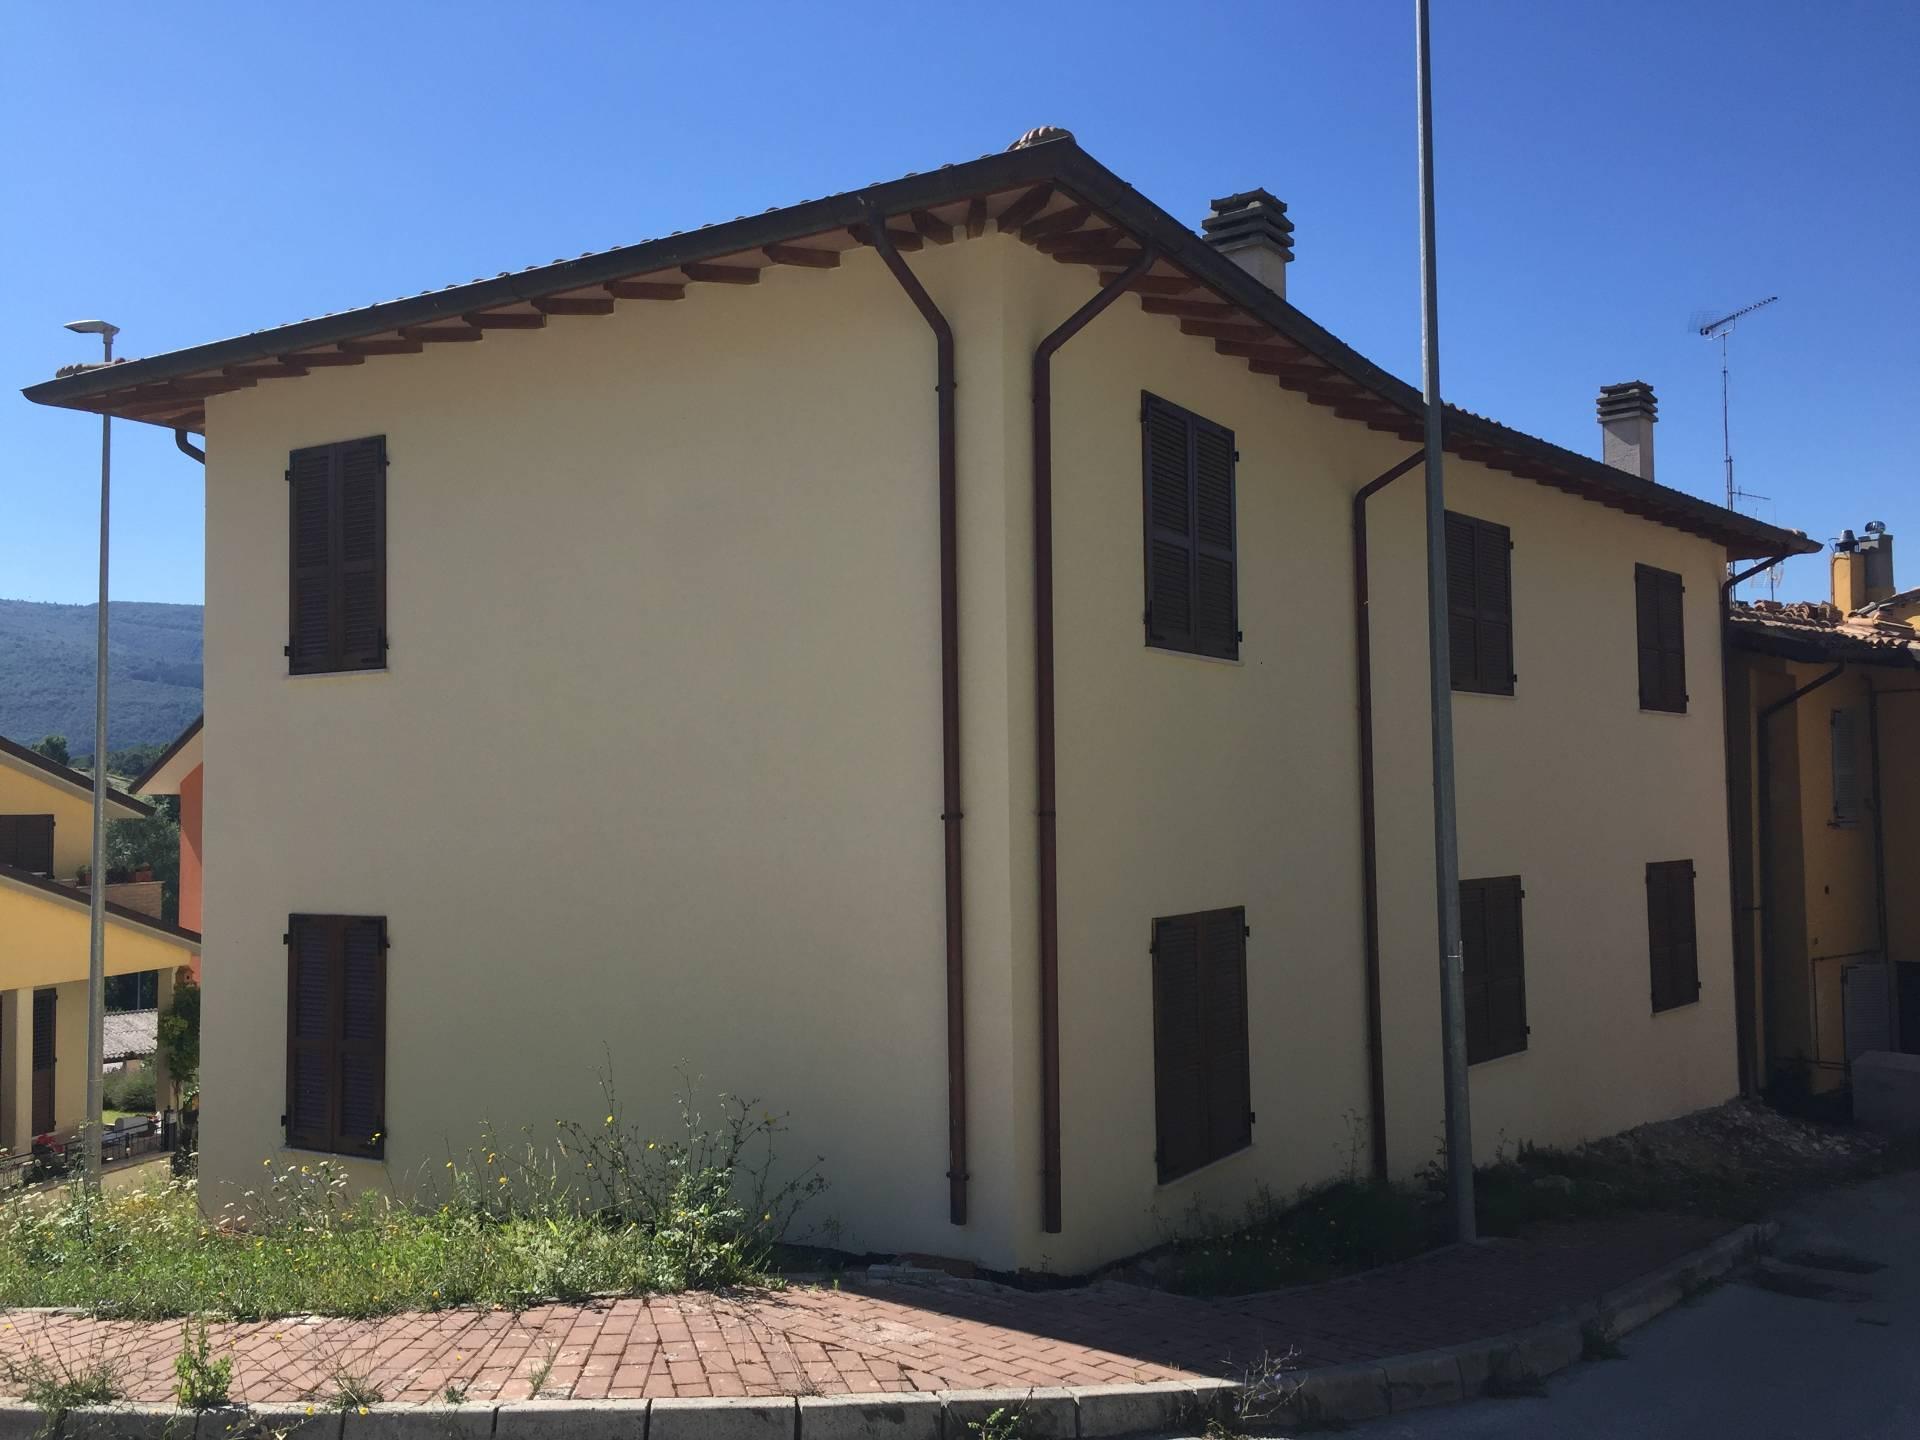 Appartamento in vendita a Nocera Umbra, 3 locali, Trattative riservate | CambioCasa.it